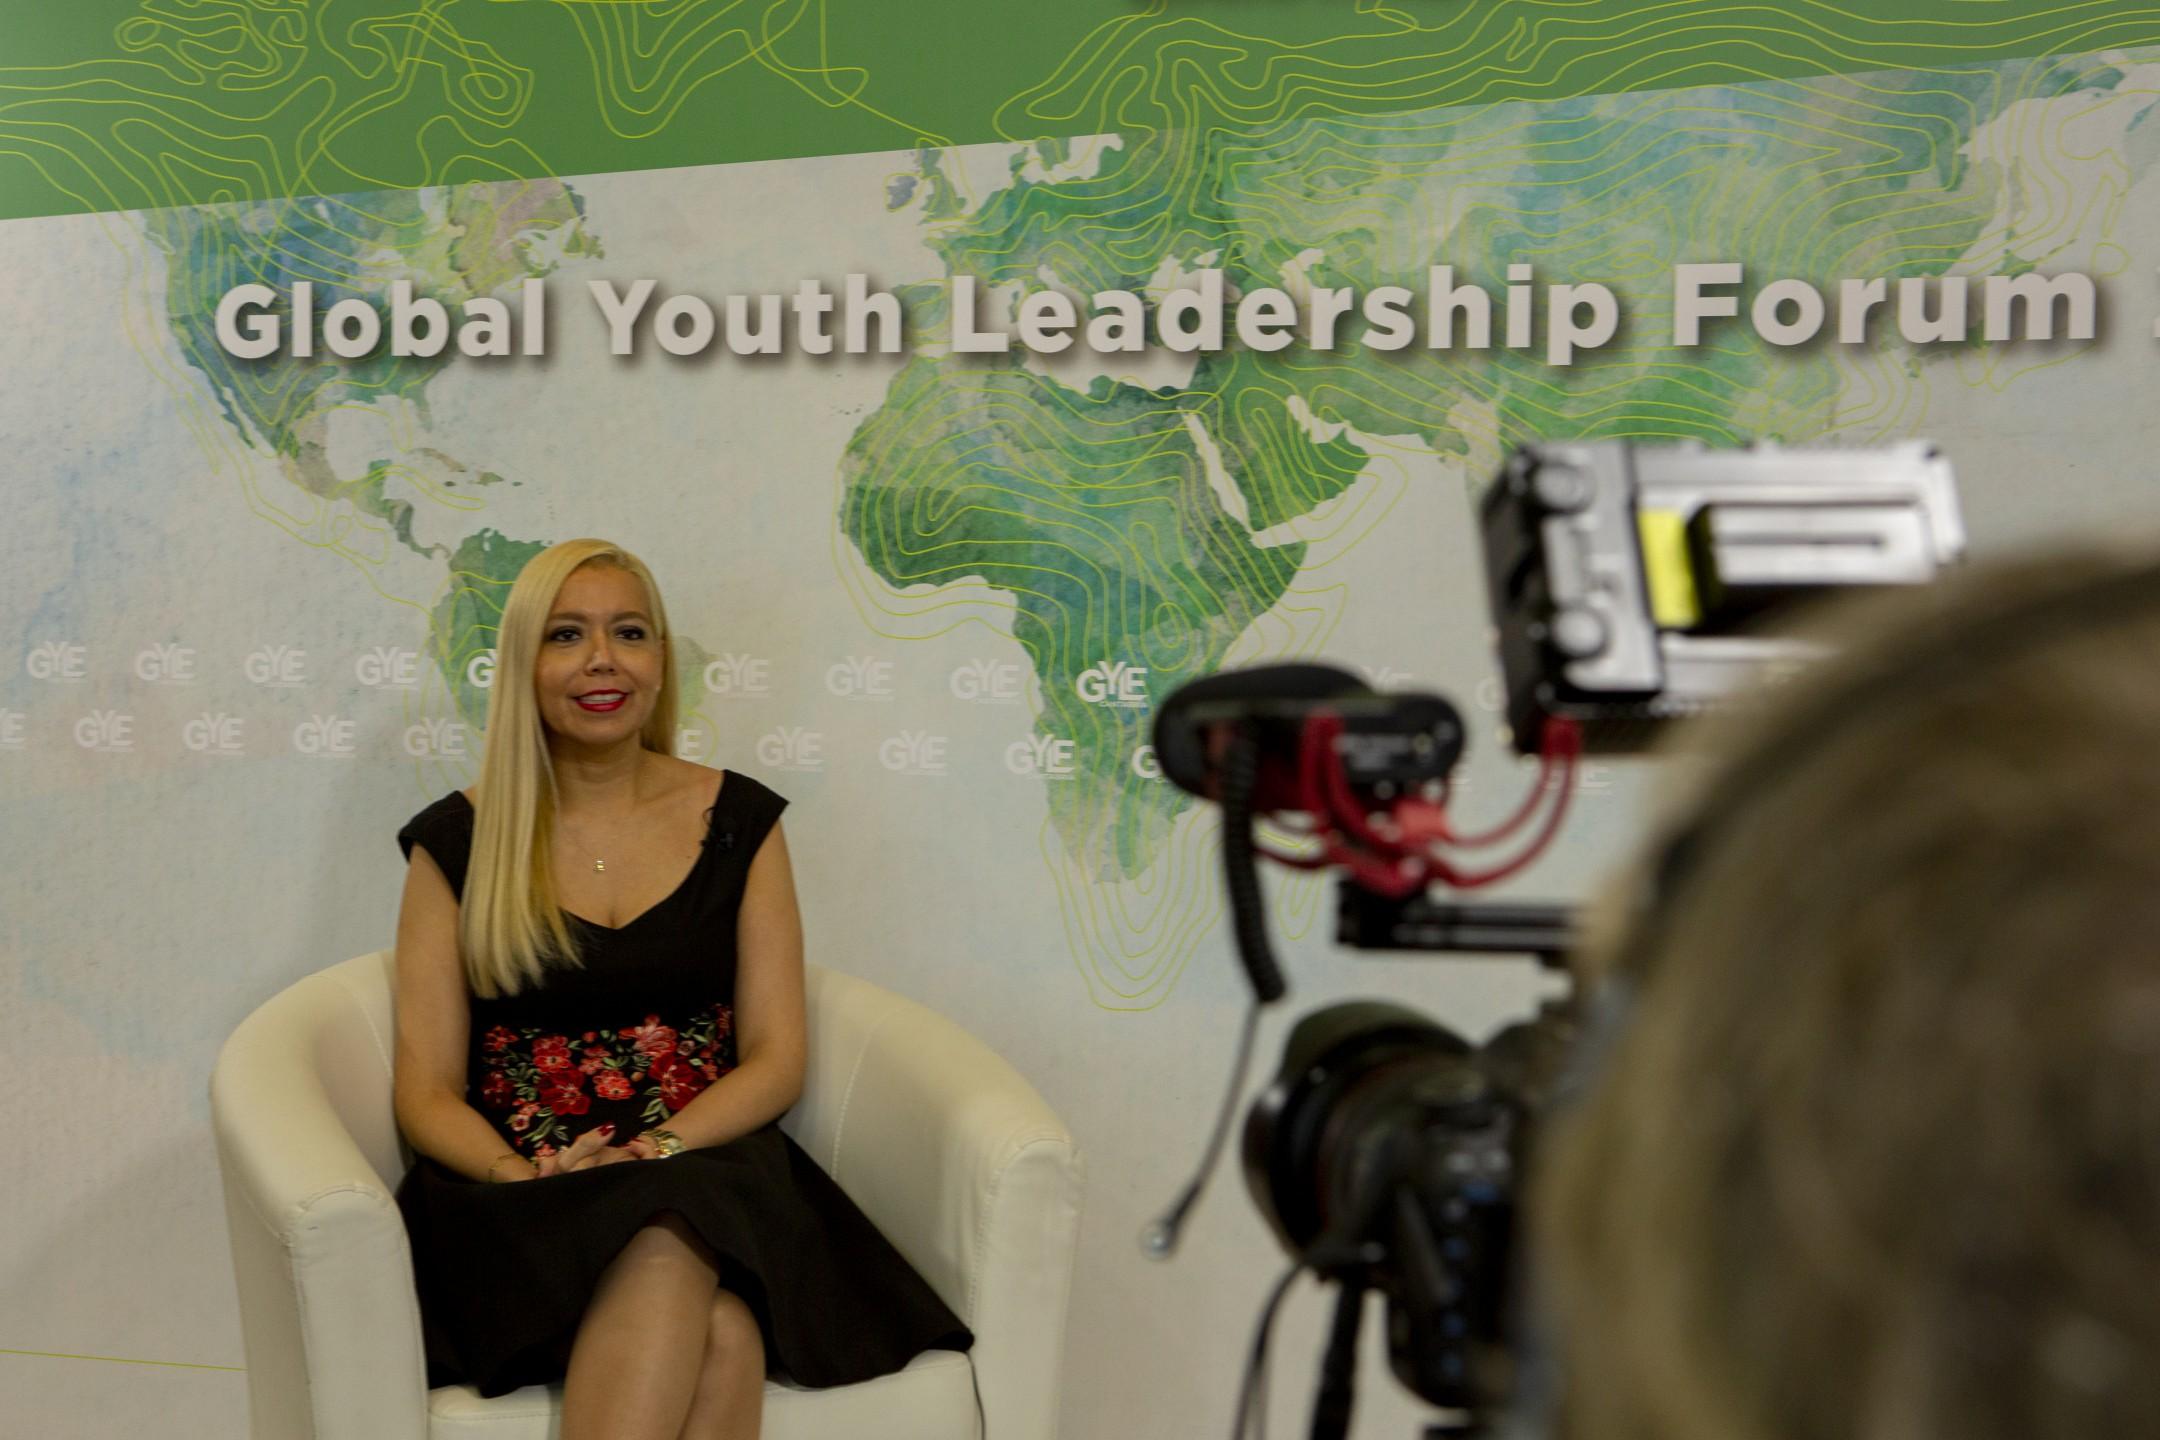 Giorgiana Martinezgarnelo, Directora General del Global Youth Leadership Forum